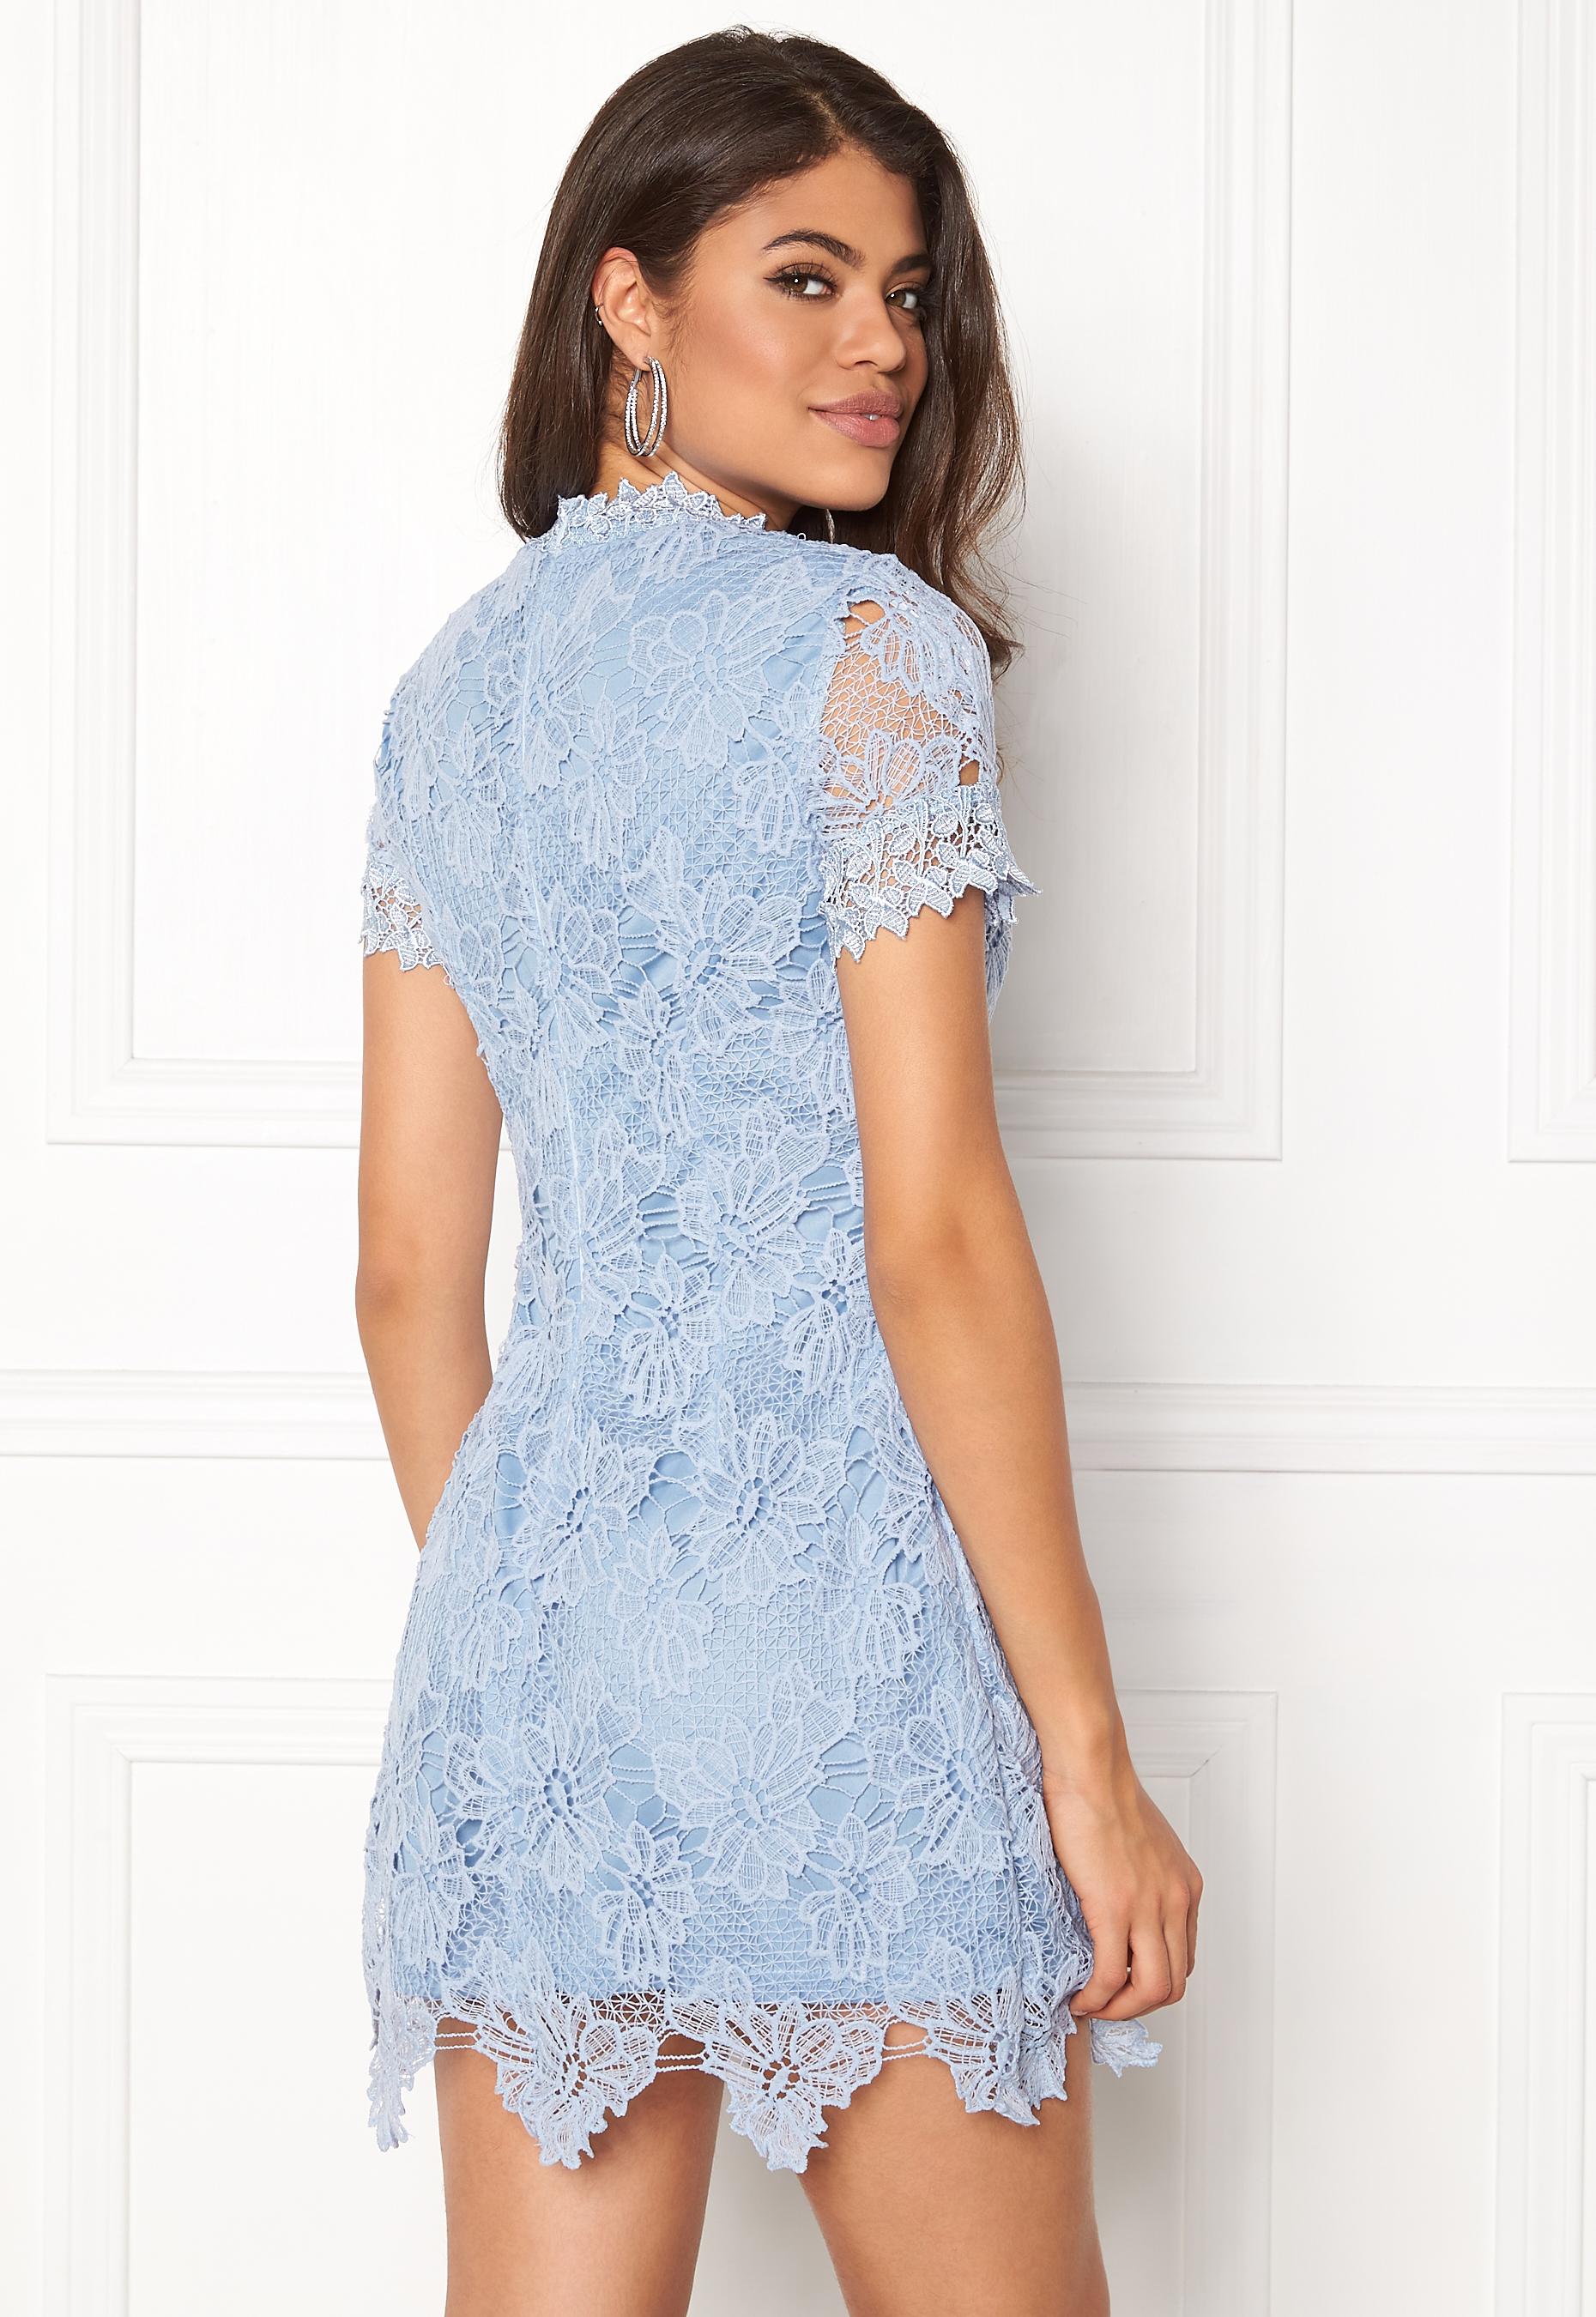 Neck High Bubbleroom Dress Paris Lace Light Ax Blue CBexord